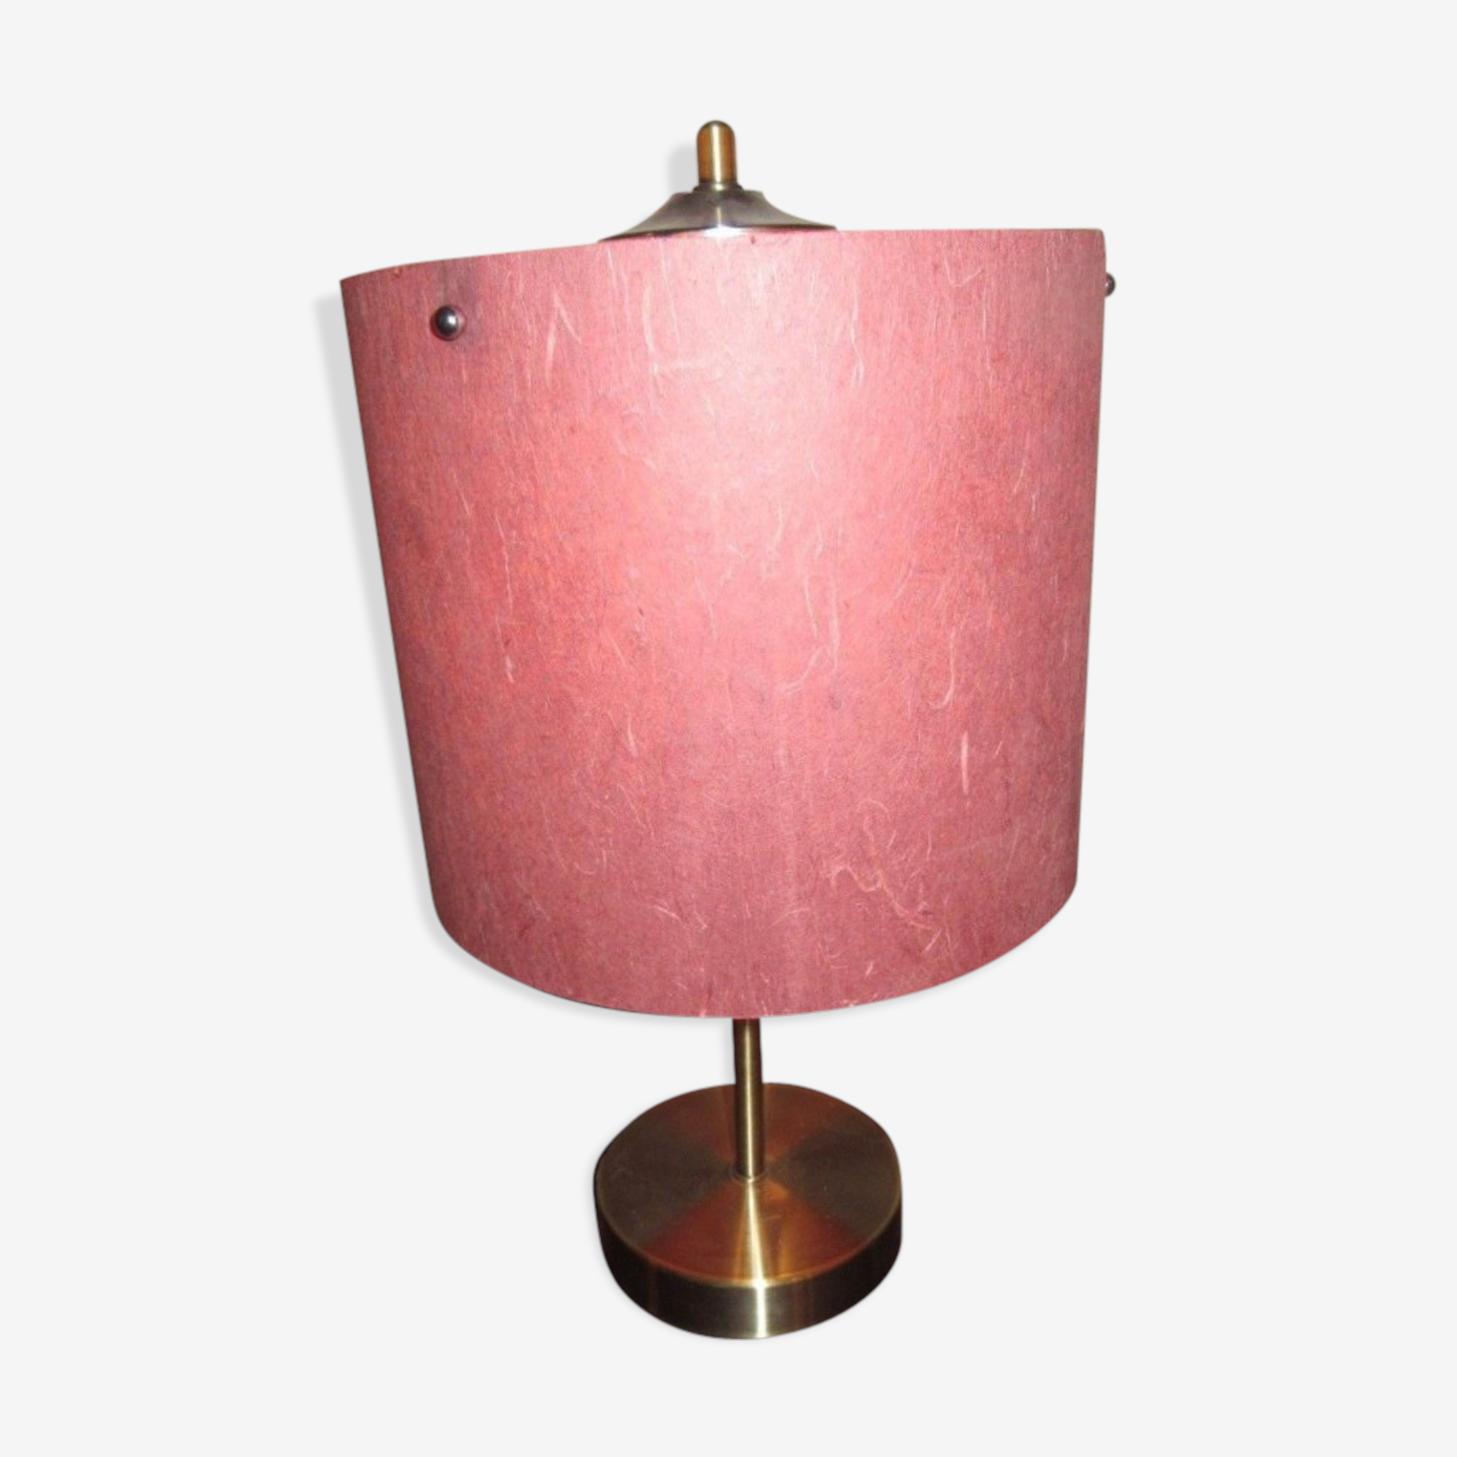 Lampe de marque Lucide